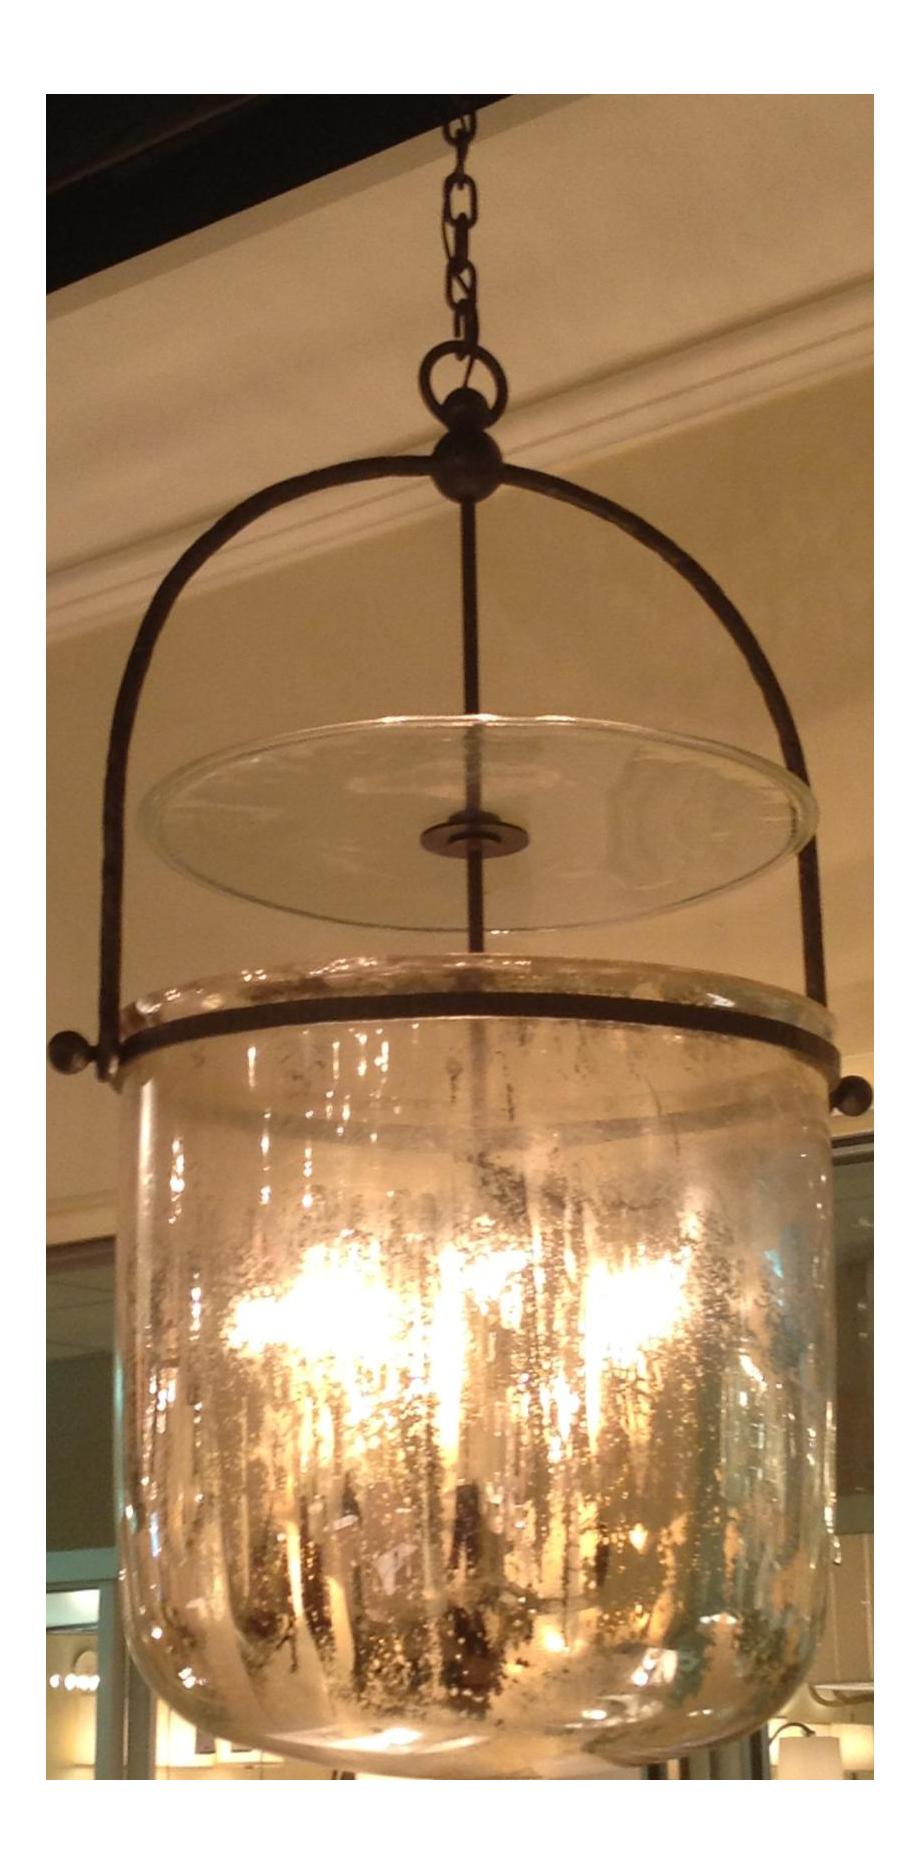 Visual comfort lorford smoke bell lantern in aged iron with visual comfort lorford smoke bell lantern in aged iron with mercury glass 4 available chairish arubaitofo Choice Image